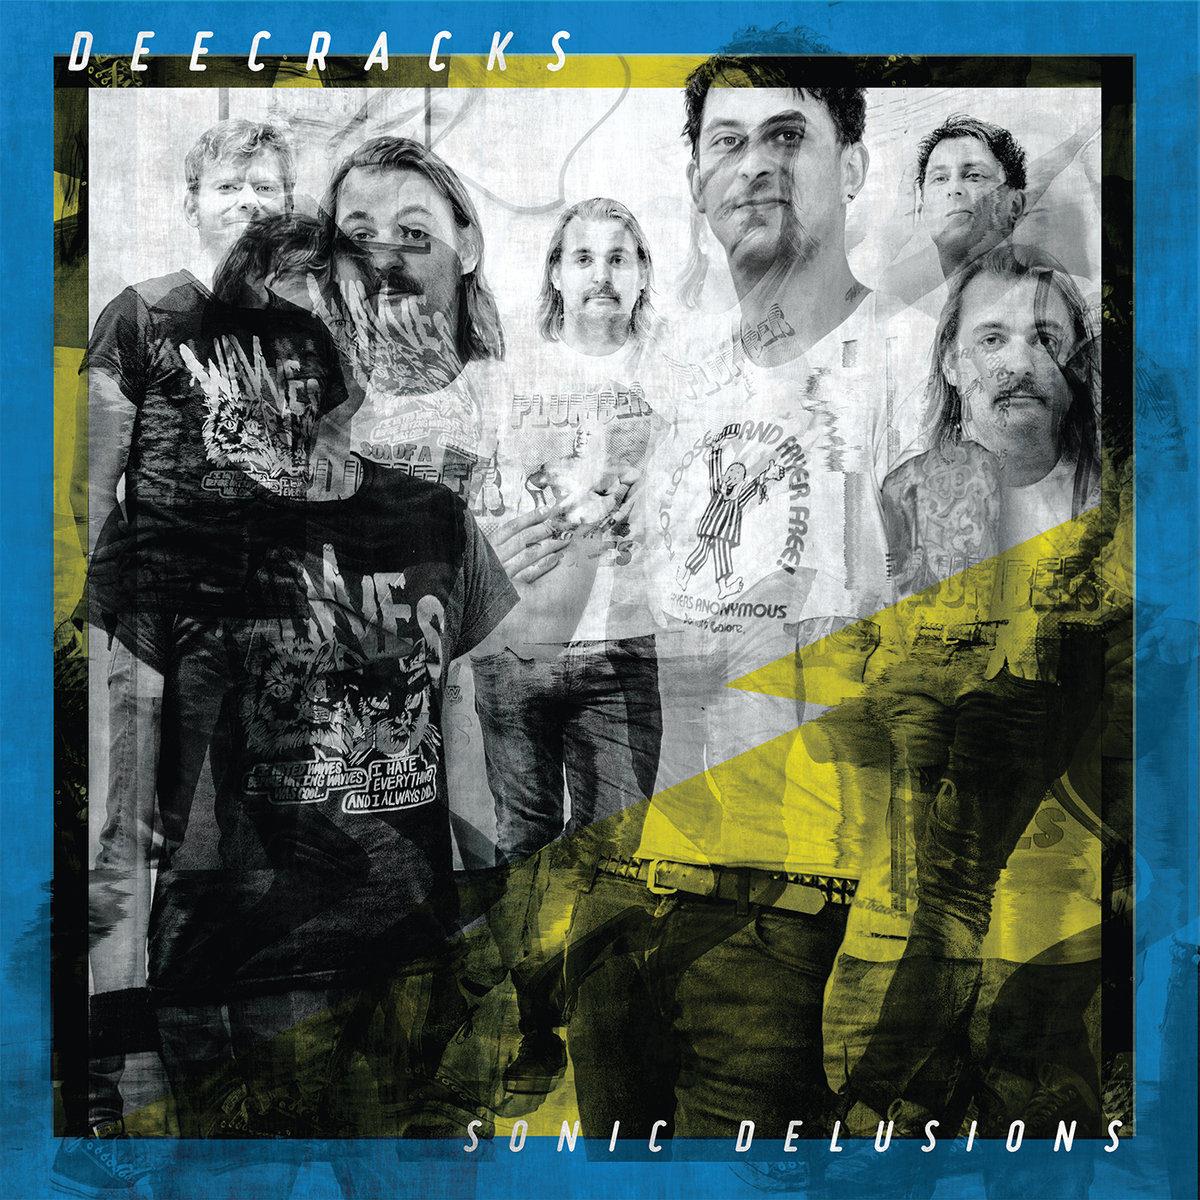 Deecracks – Sonic Delusions (Vinyl)